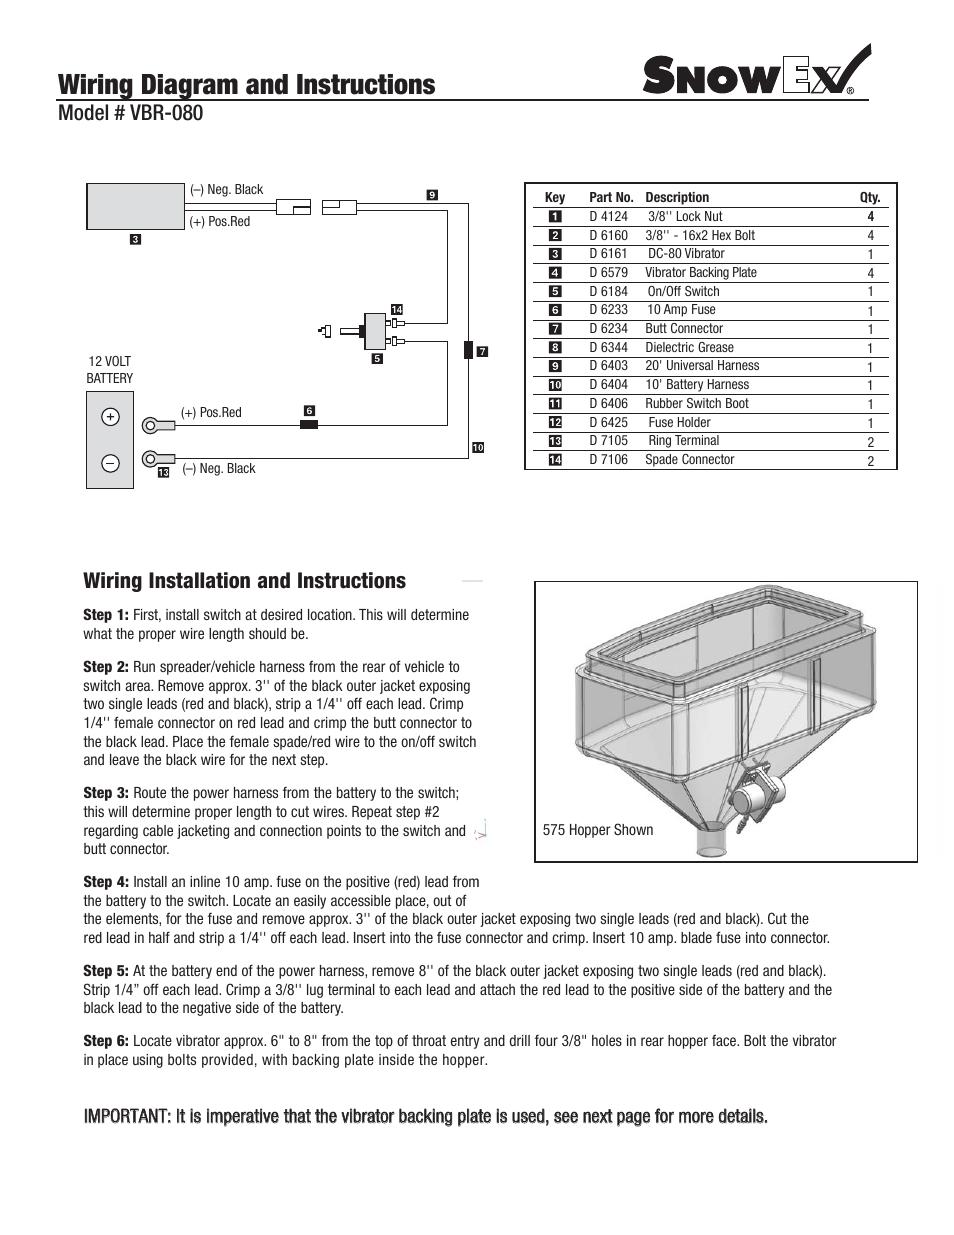 Snowex Vbr 080 User Manual 2 Pages SnowEx 575 Motor Snowex 575 Wiring  Diagram